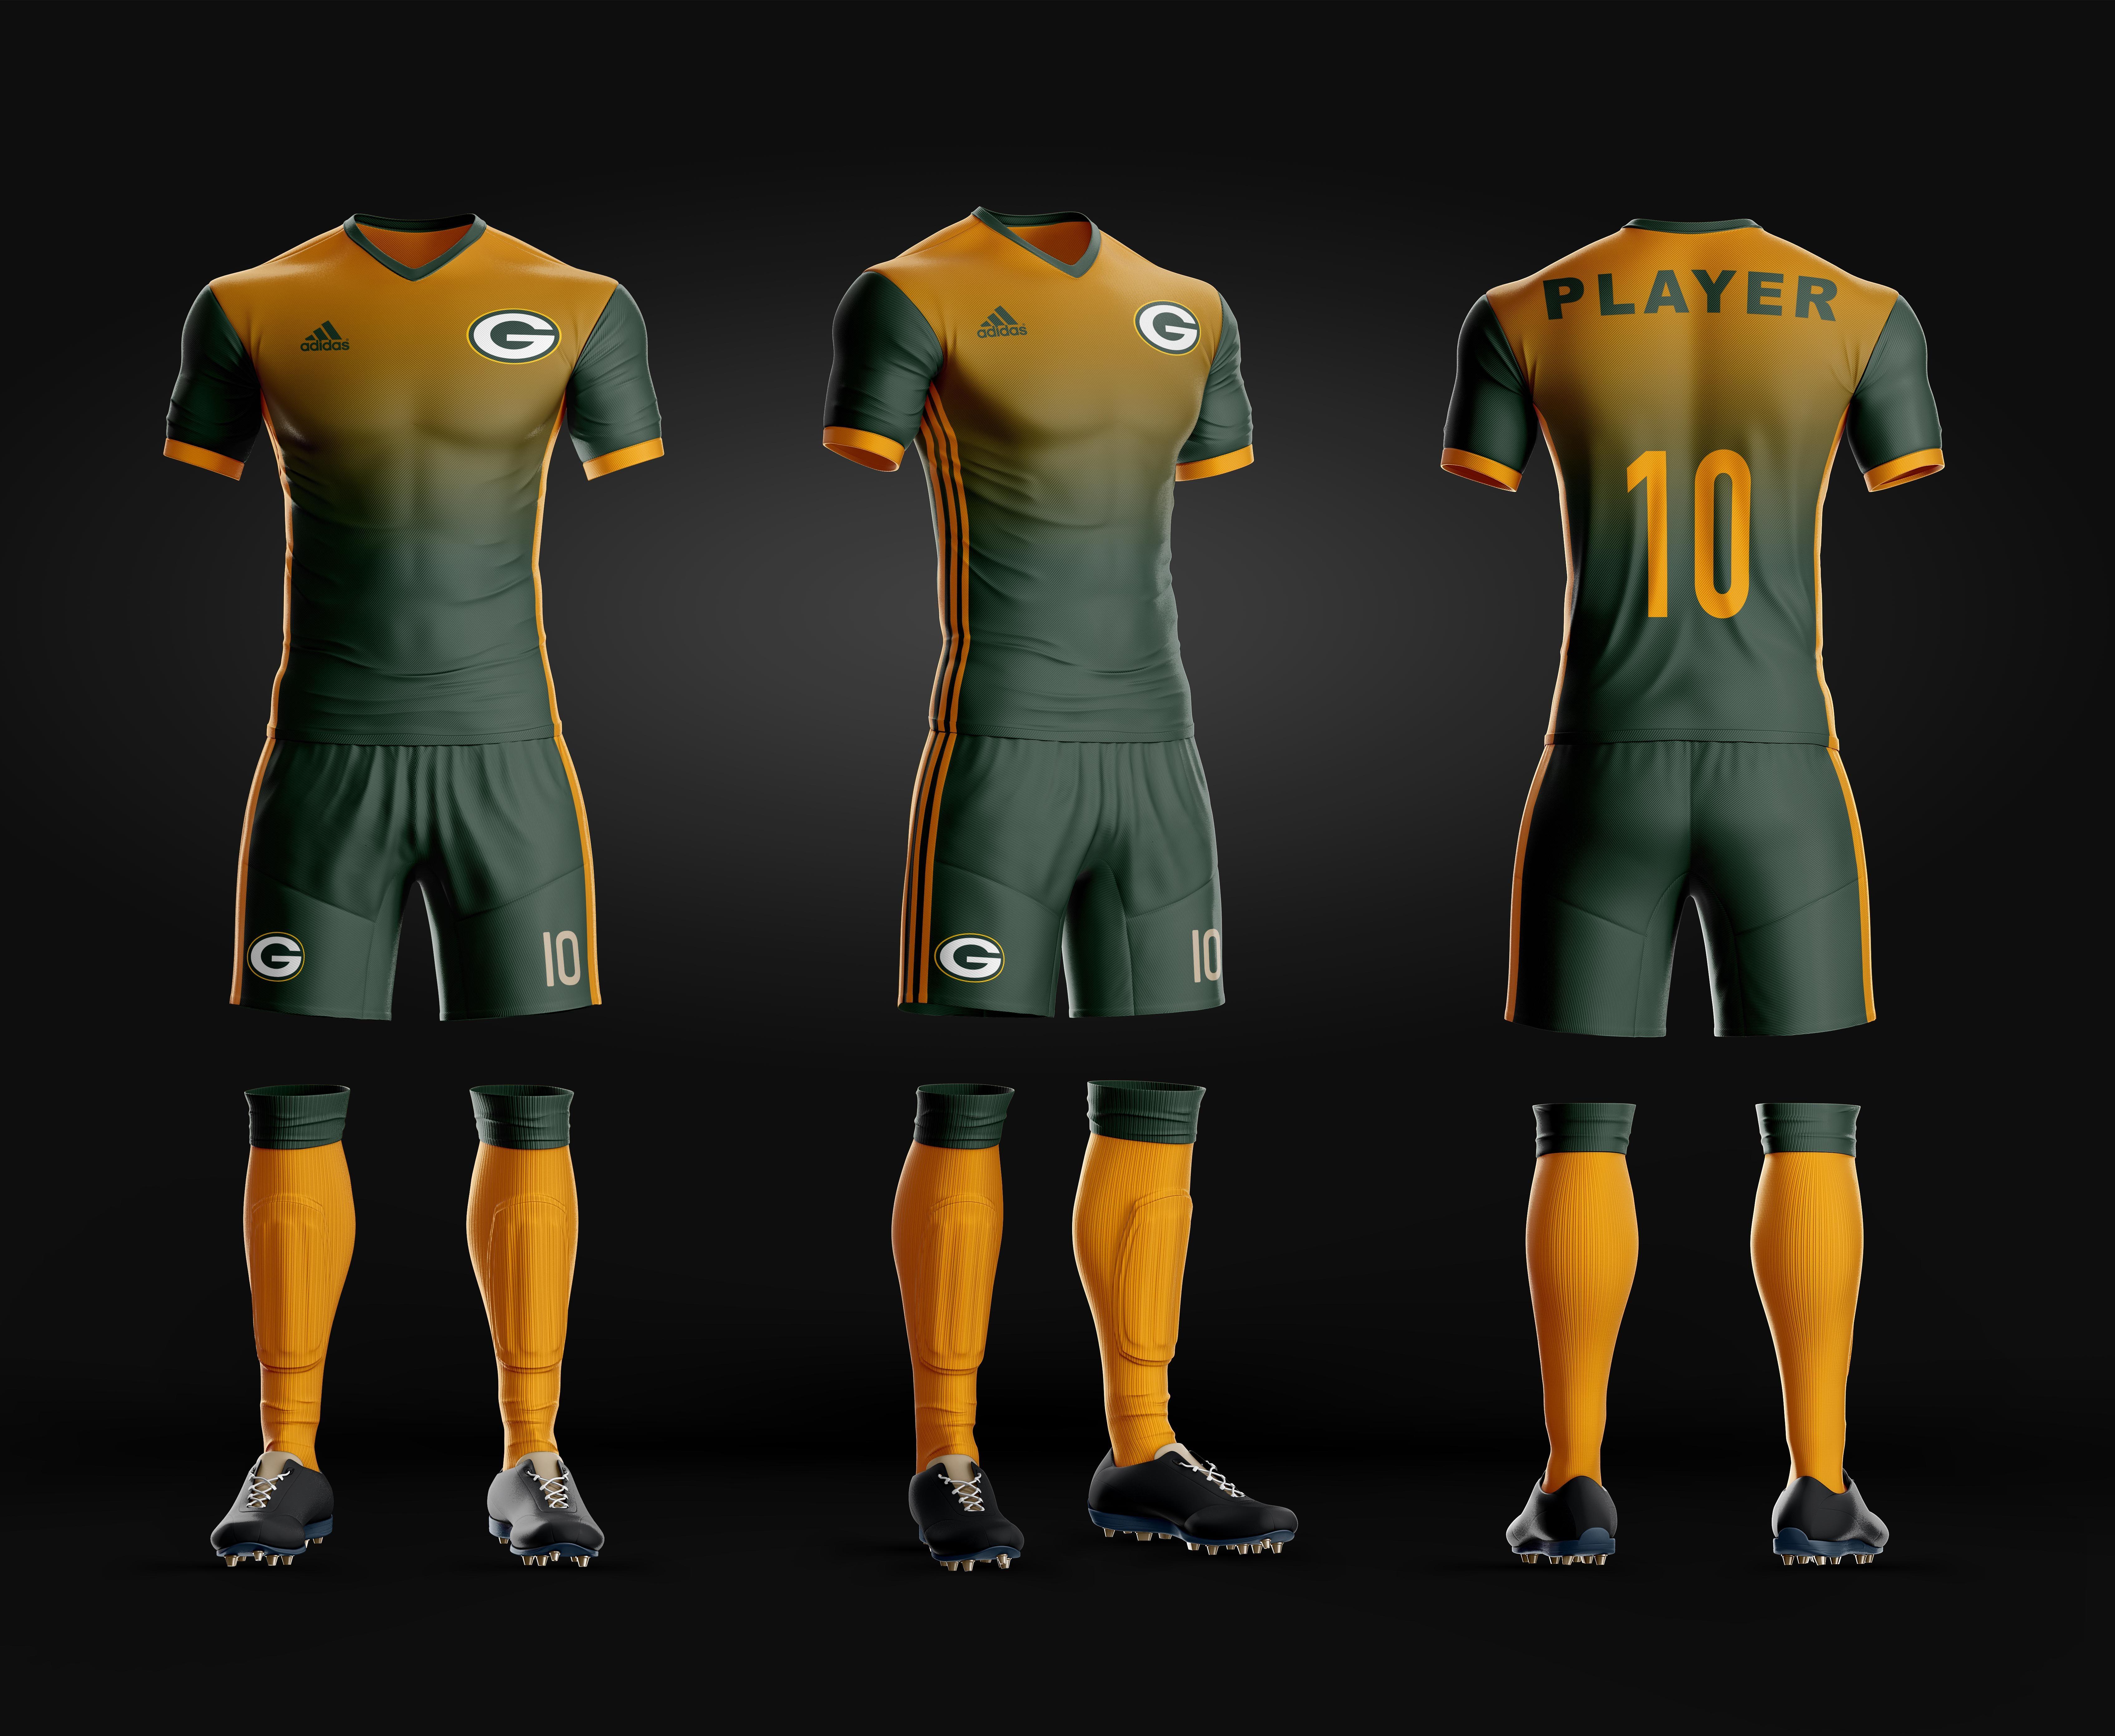 Soccer Uniform Green Bay Packers Home Uniformes Futebol Camisas De Futebol Futebol